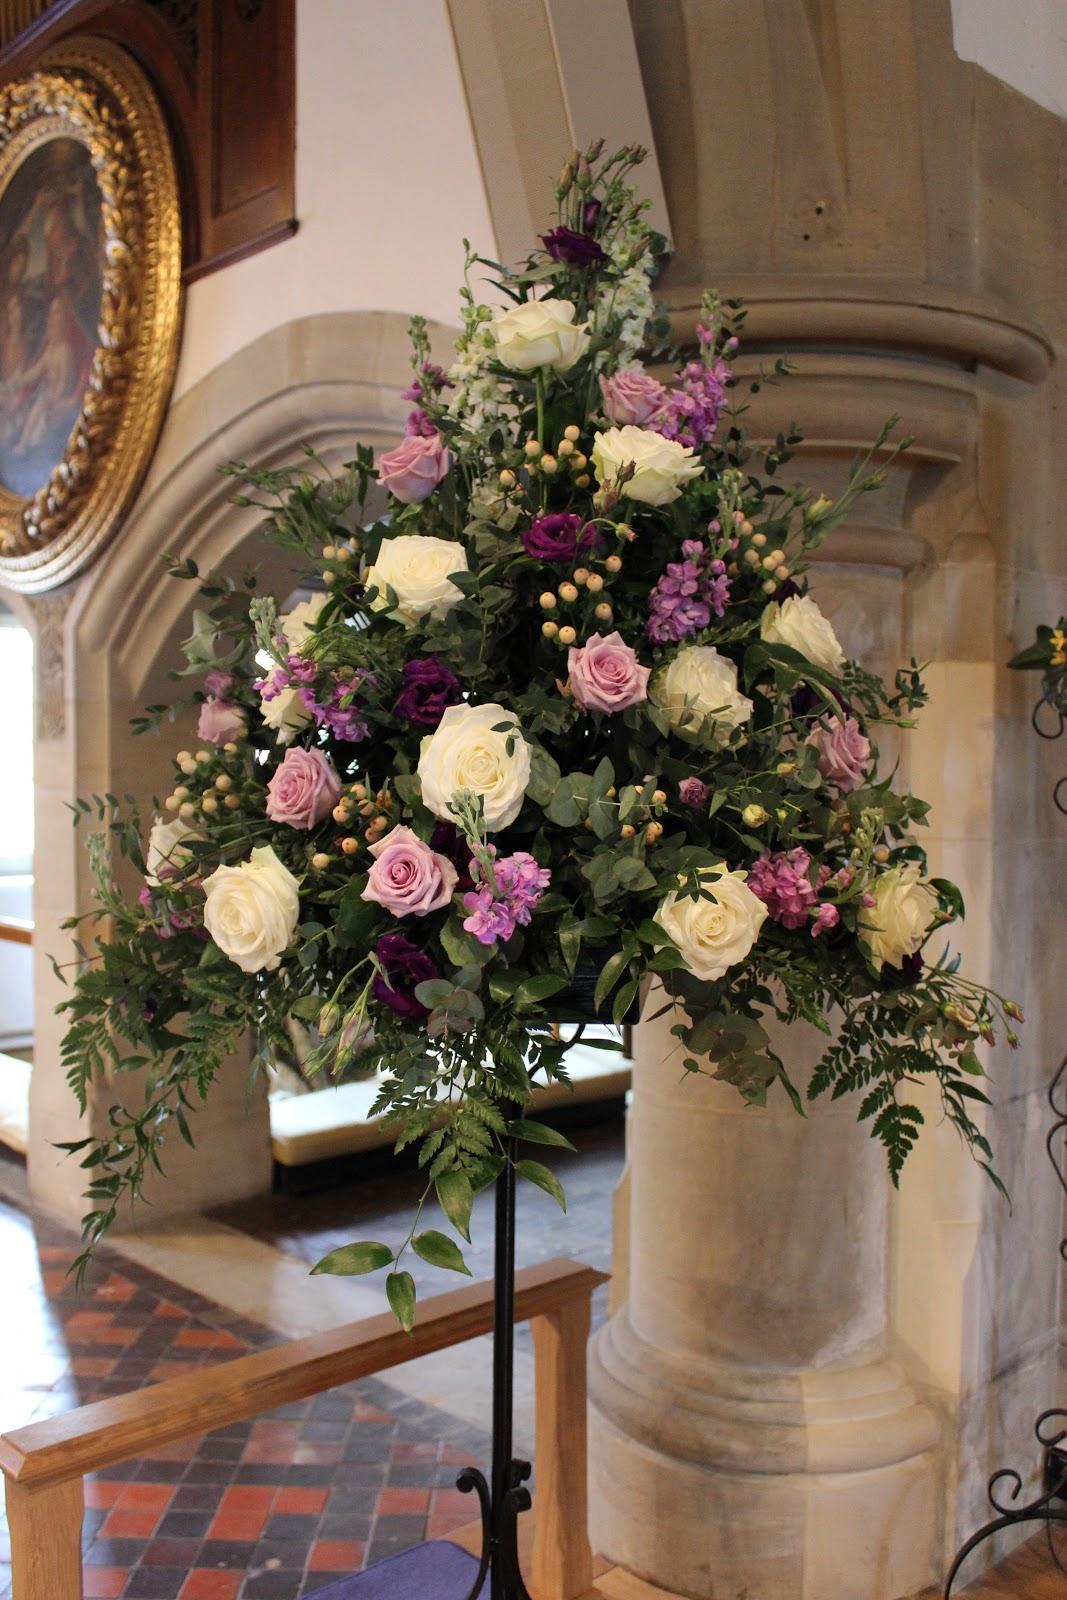 Broadview florist may